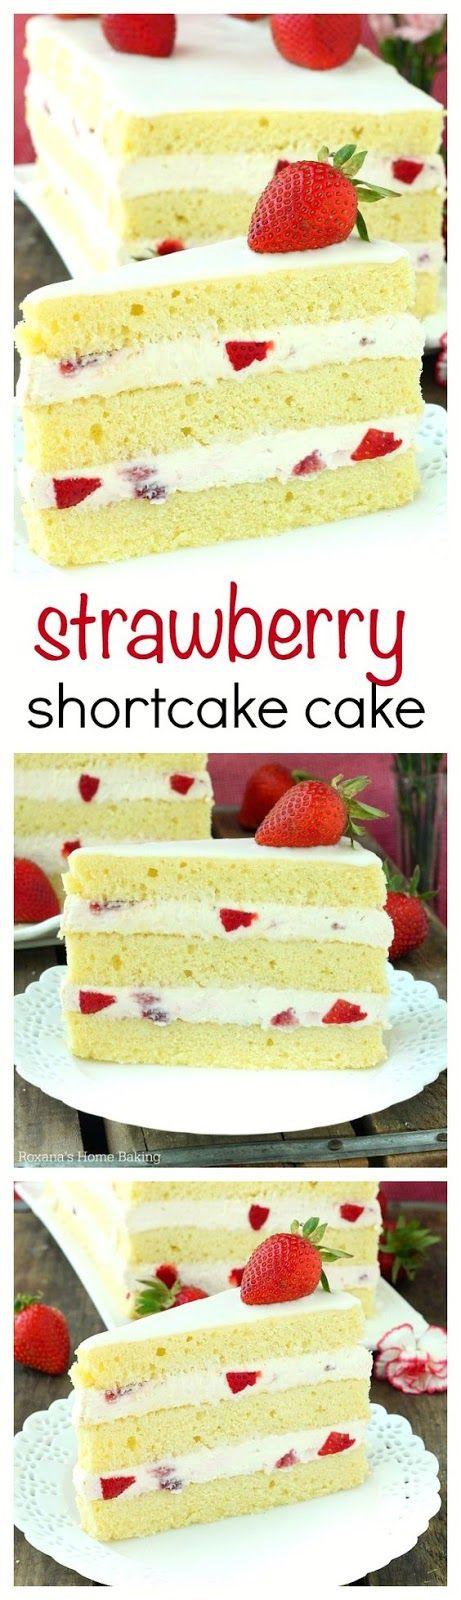 STRAWBERRY SHORTCAKE CAKE RECIPE | Cake And Food Recipe